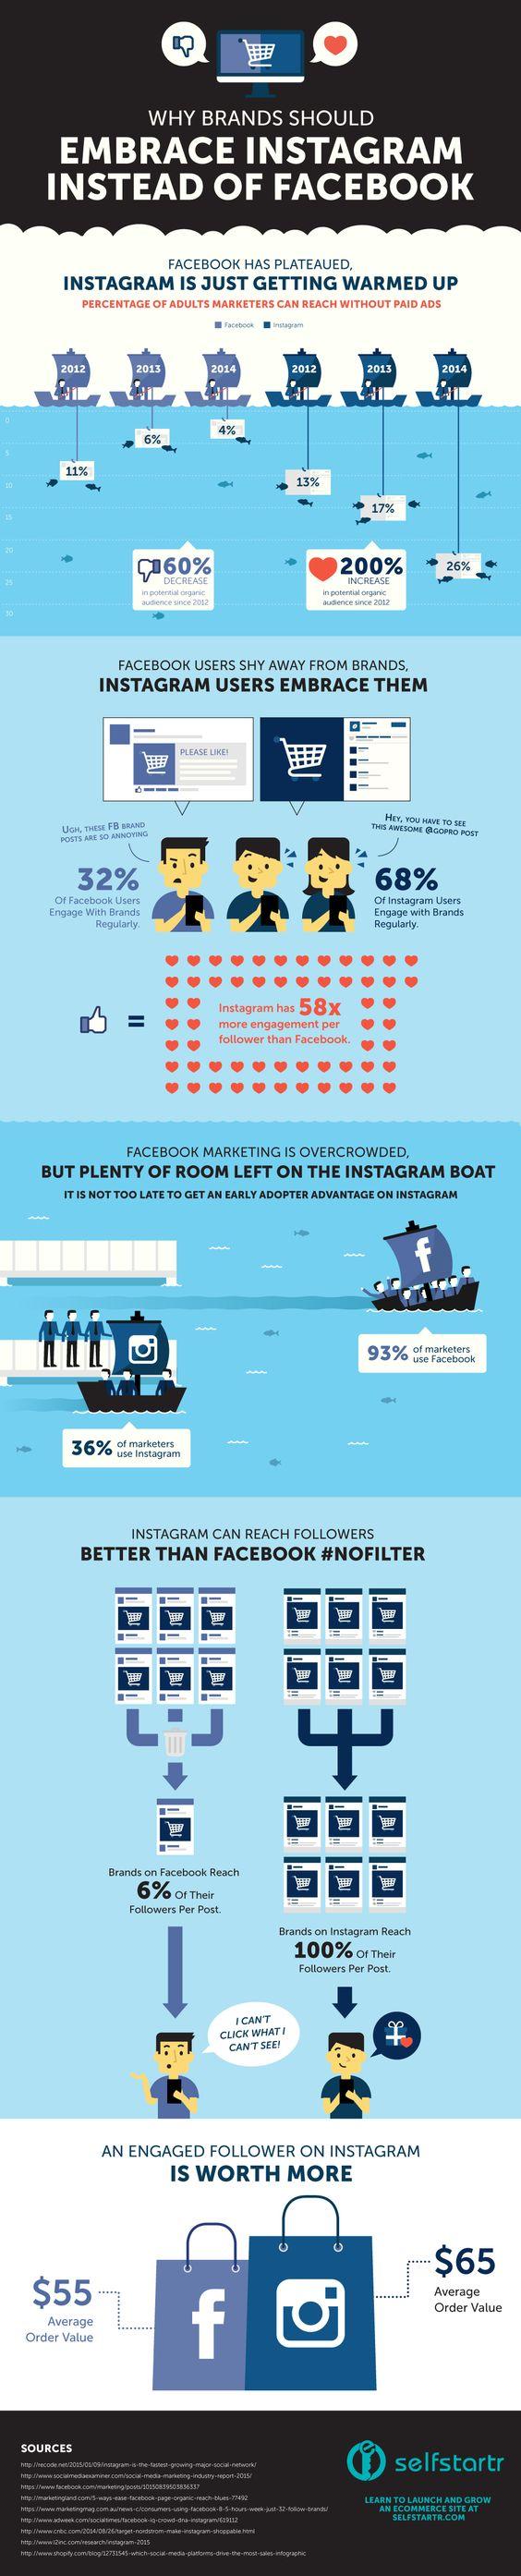 Why Brands Should Consider Instagram Over Facebook [Infographic] - @socialmedia2day